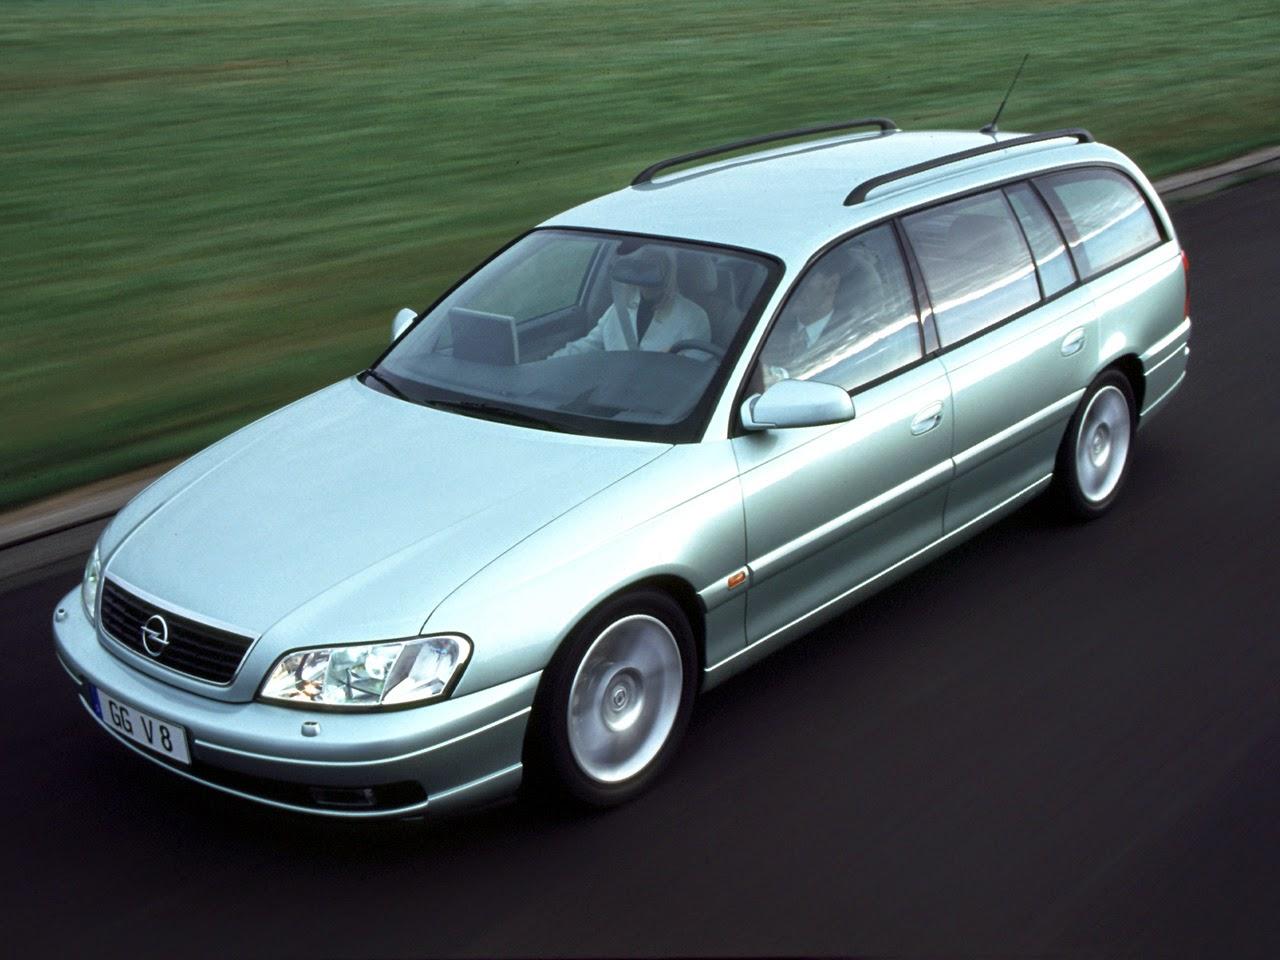 Opel Omega V8 Caravan